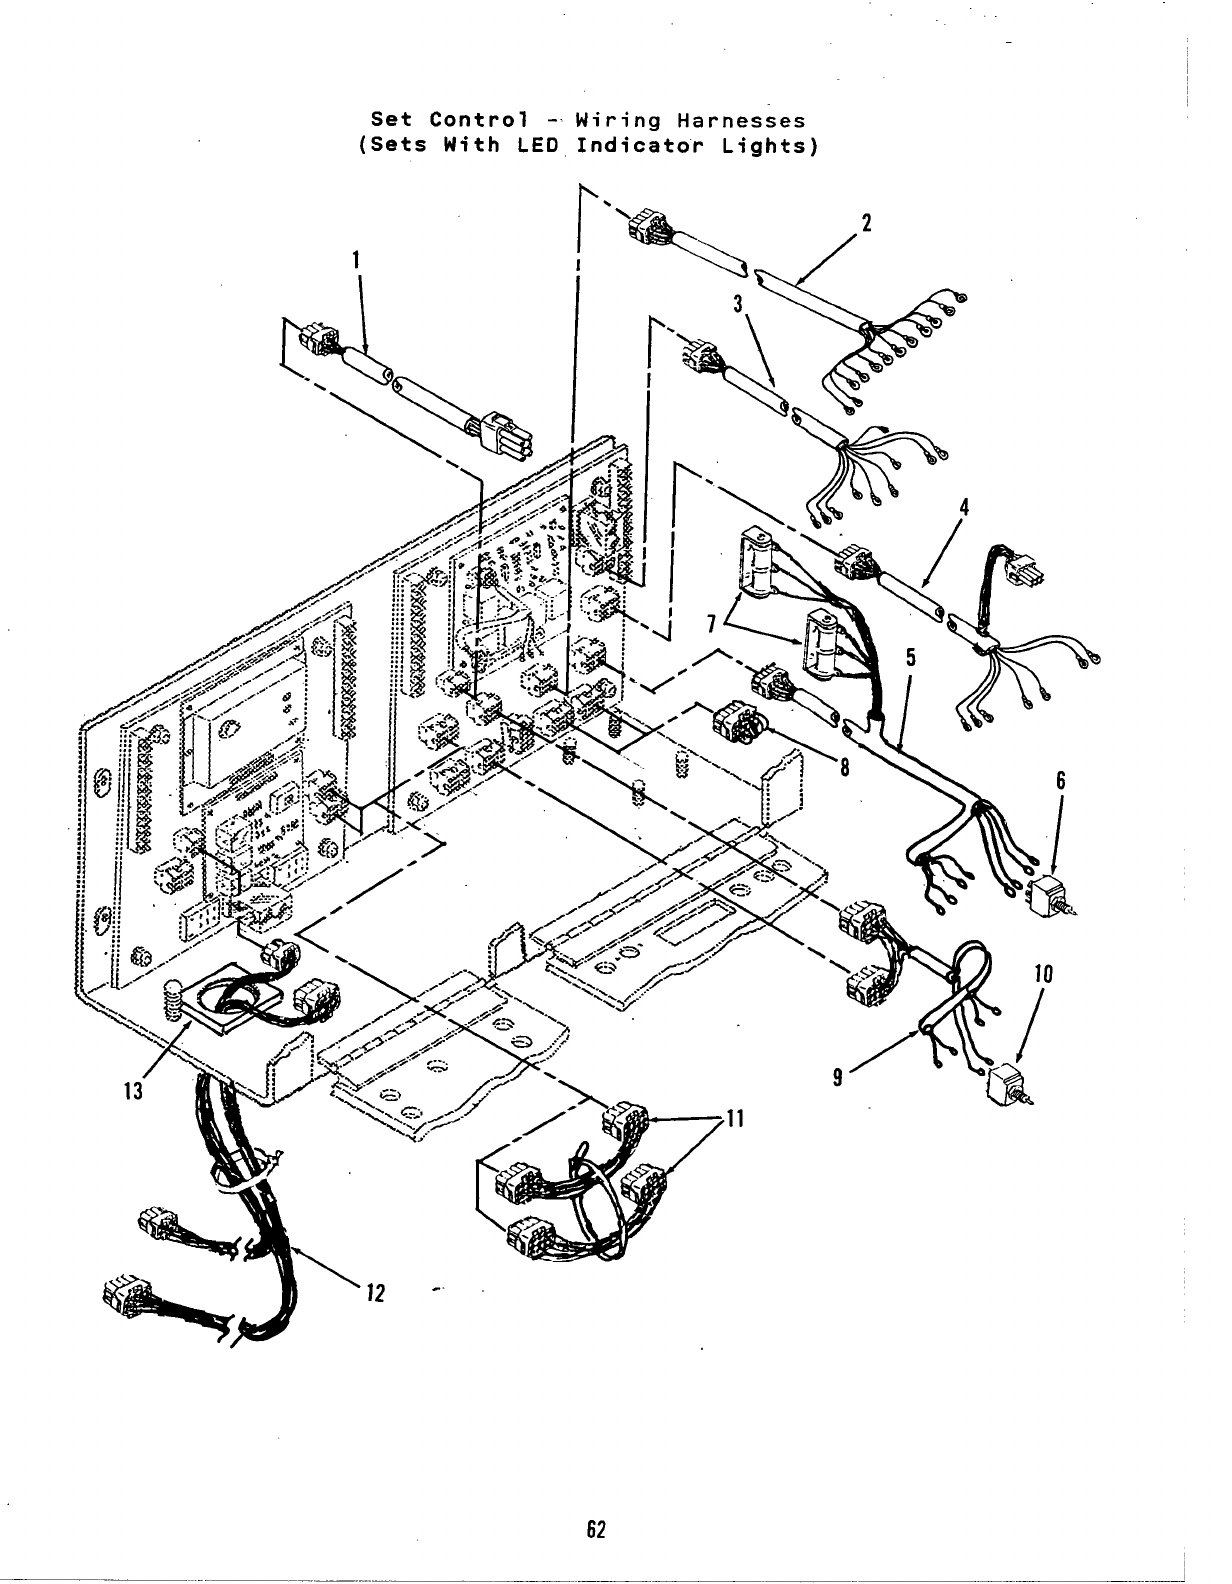 kgv6163 tmp 904 0209 onan nt nta ntta  spec a d  pmg genset parts manual  02 1989